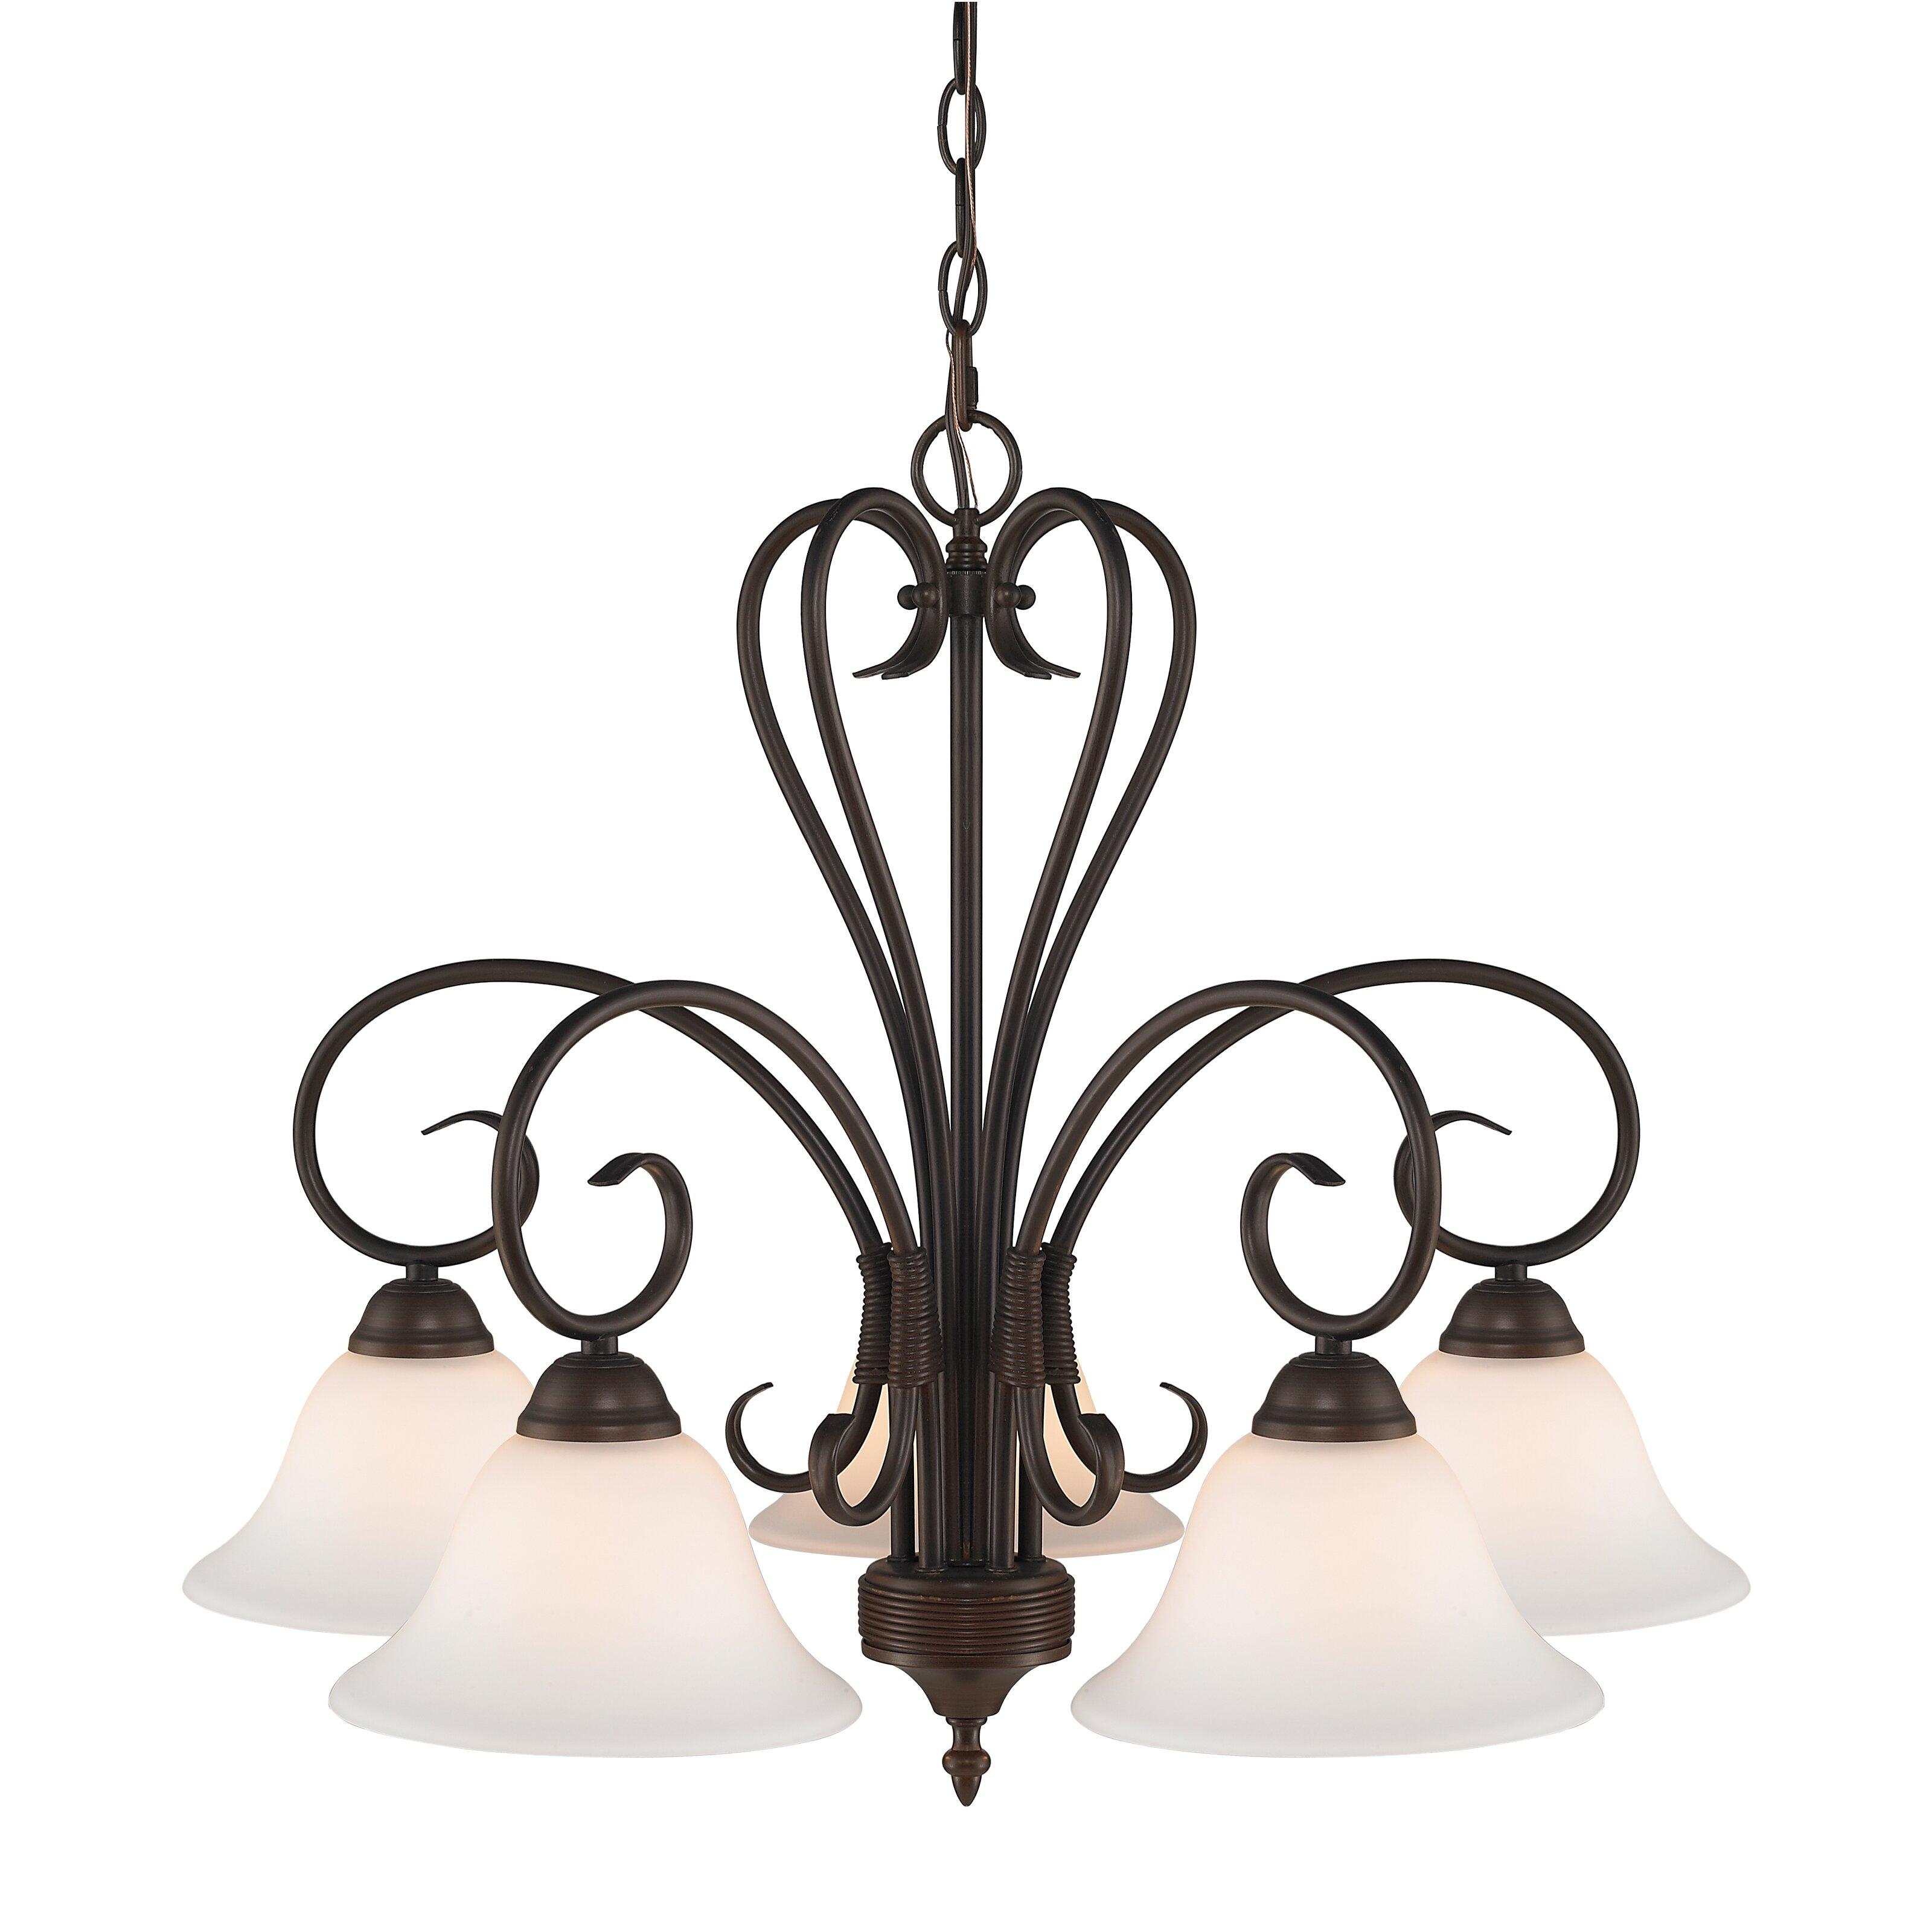 Wildon Home ® Sienna 5 Light Nook Chandelier & Reviews